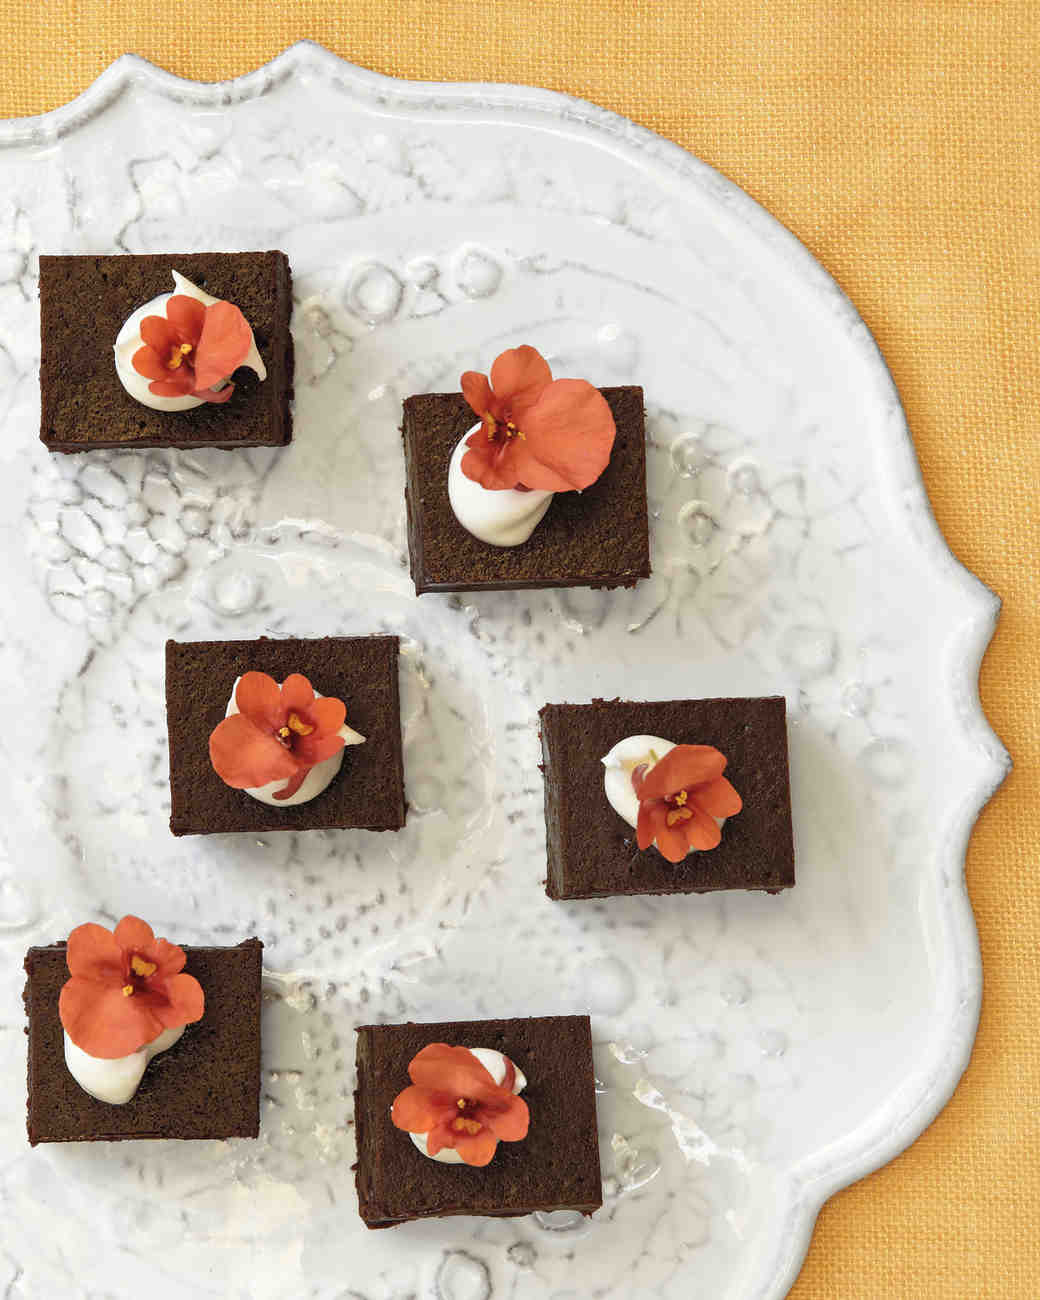 desserts-49-mwd109382.jpg